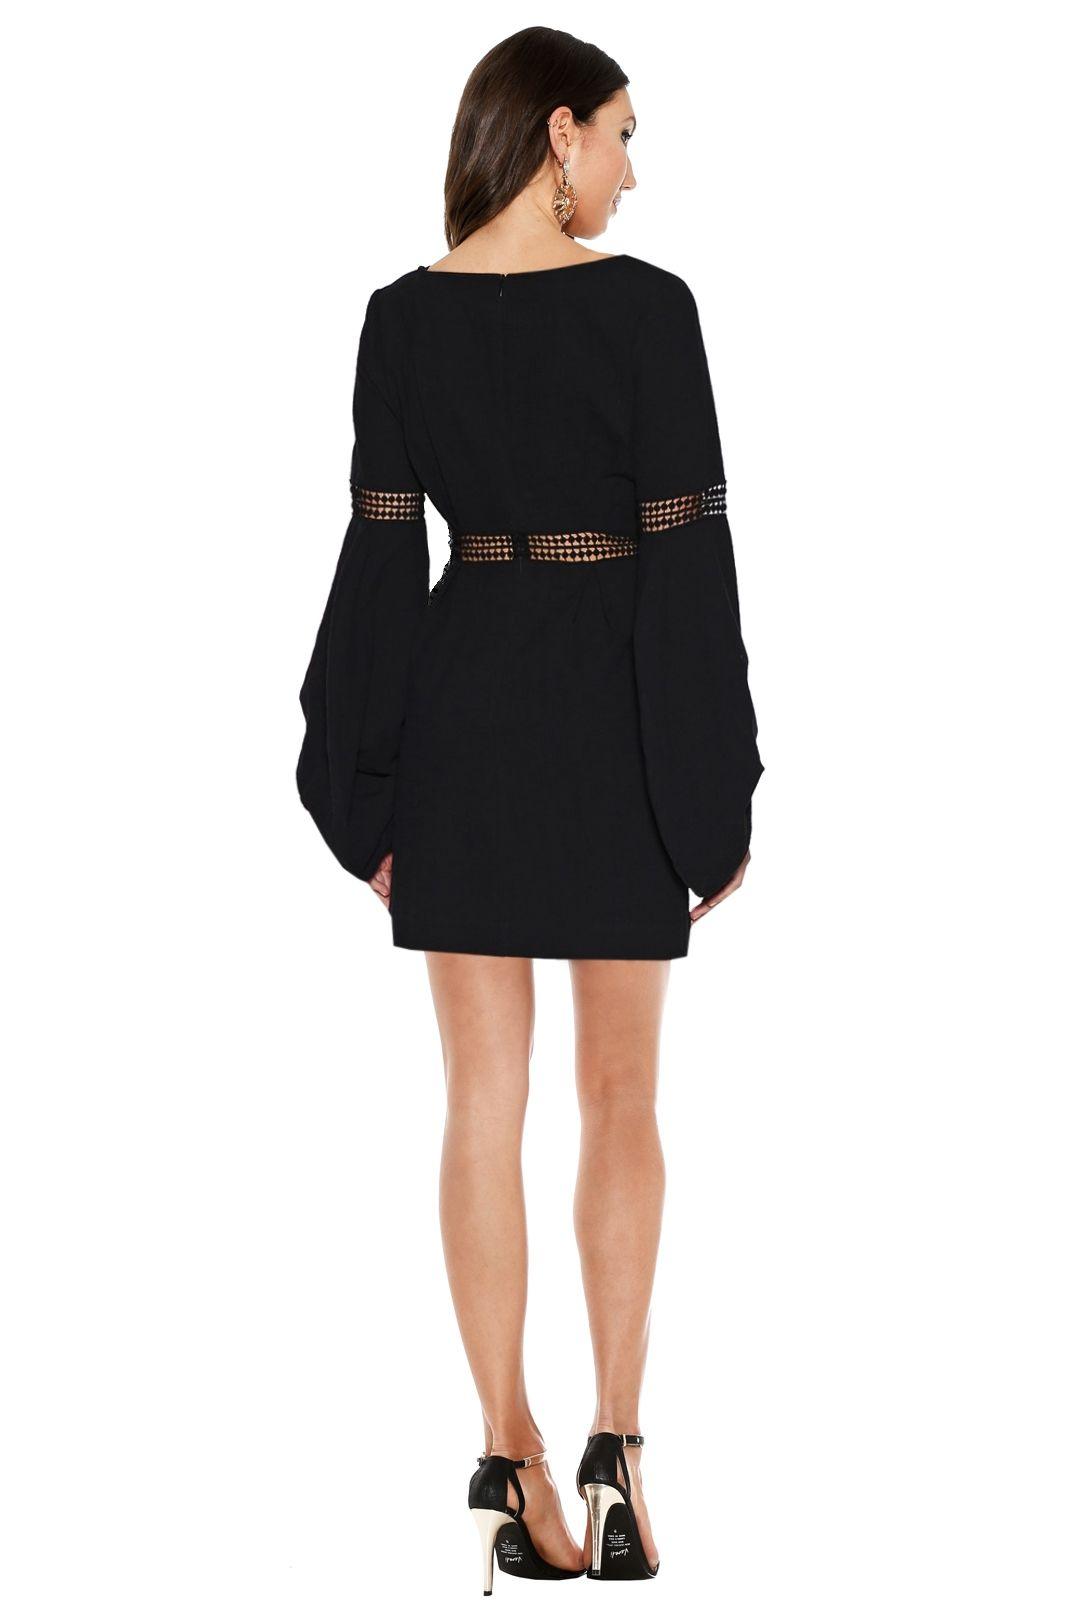 Ministry of Style - Fleeting Dress - Black - Back